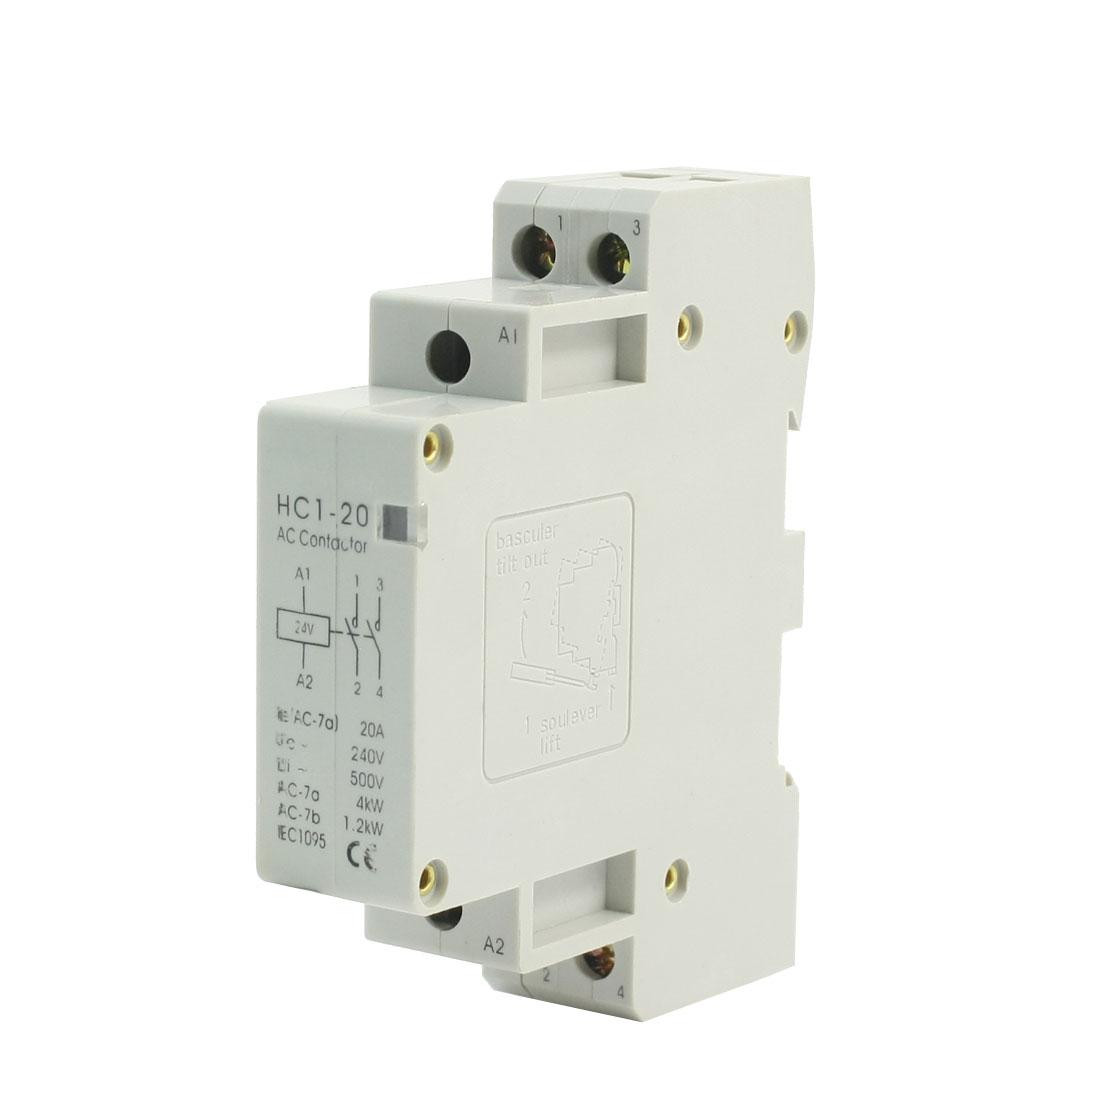 24V Coil 20A 2 Pole 6 Screw Terminal Motor Control AC Contactor HC1-20